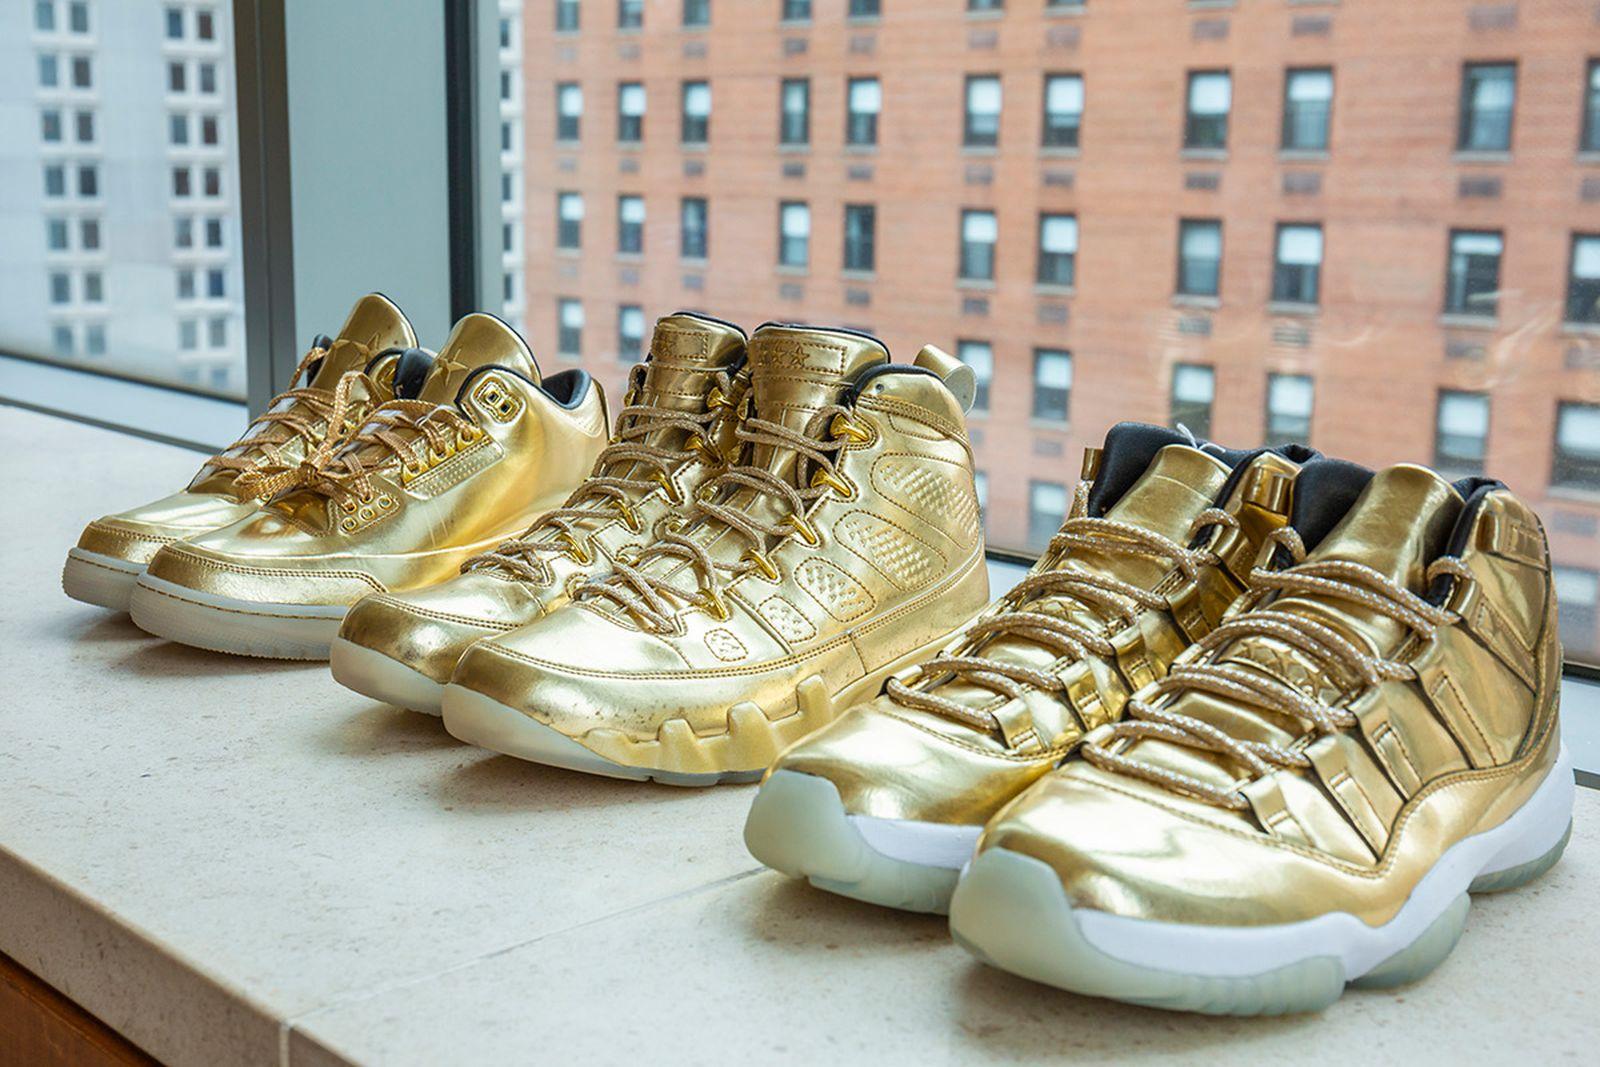 sothebys-rare-nike-sneaker-auction-03